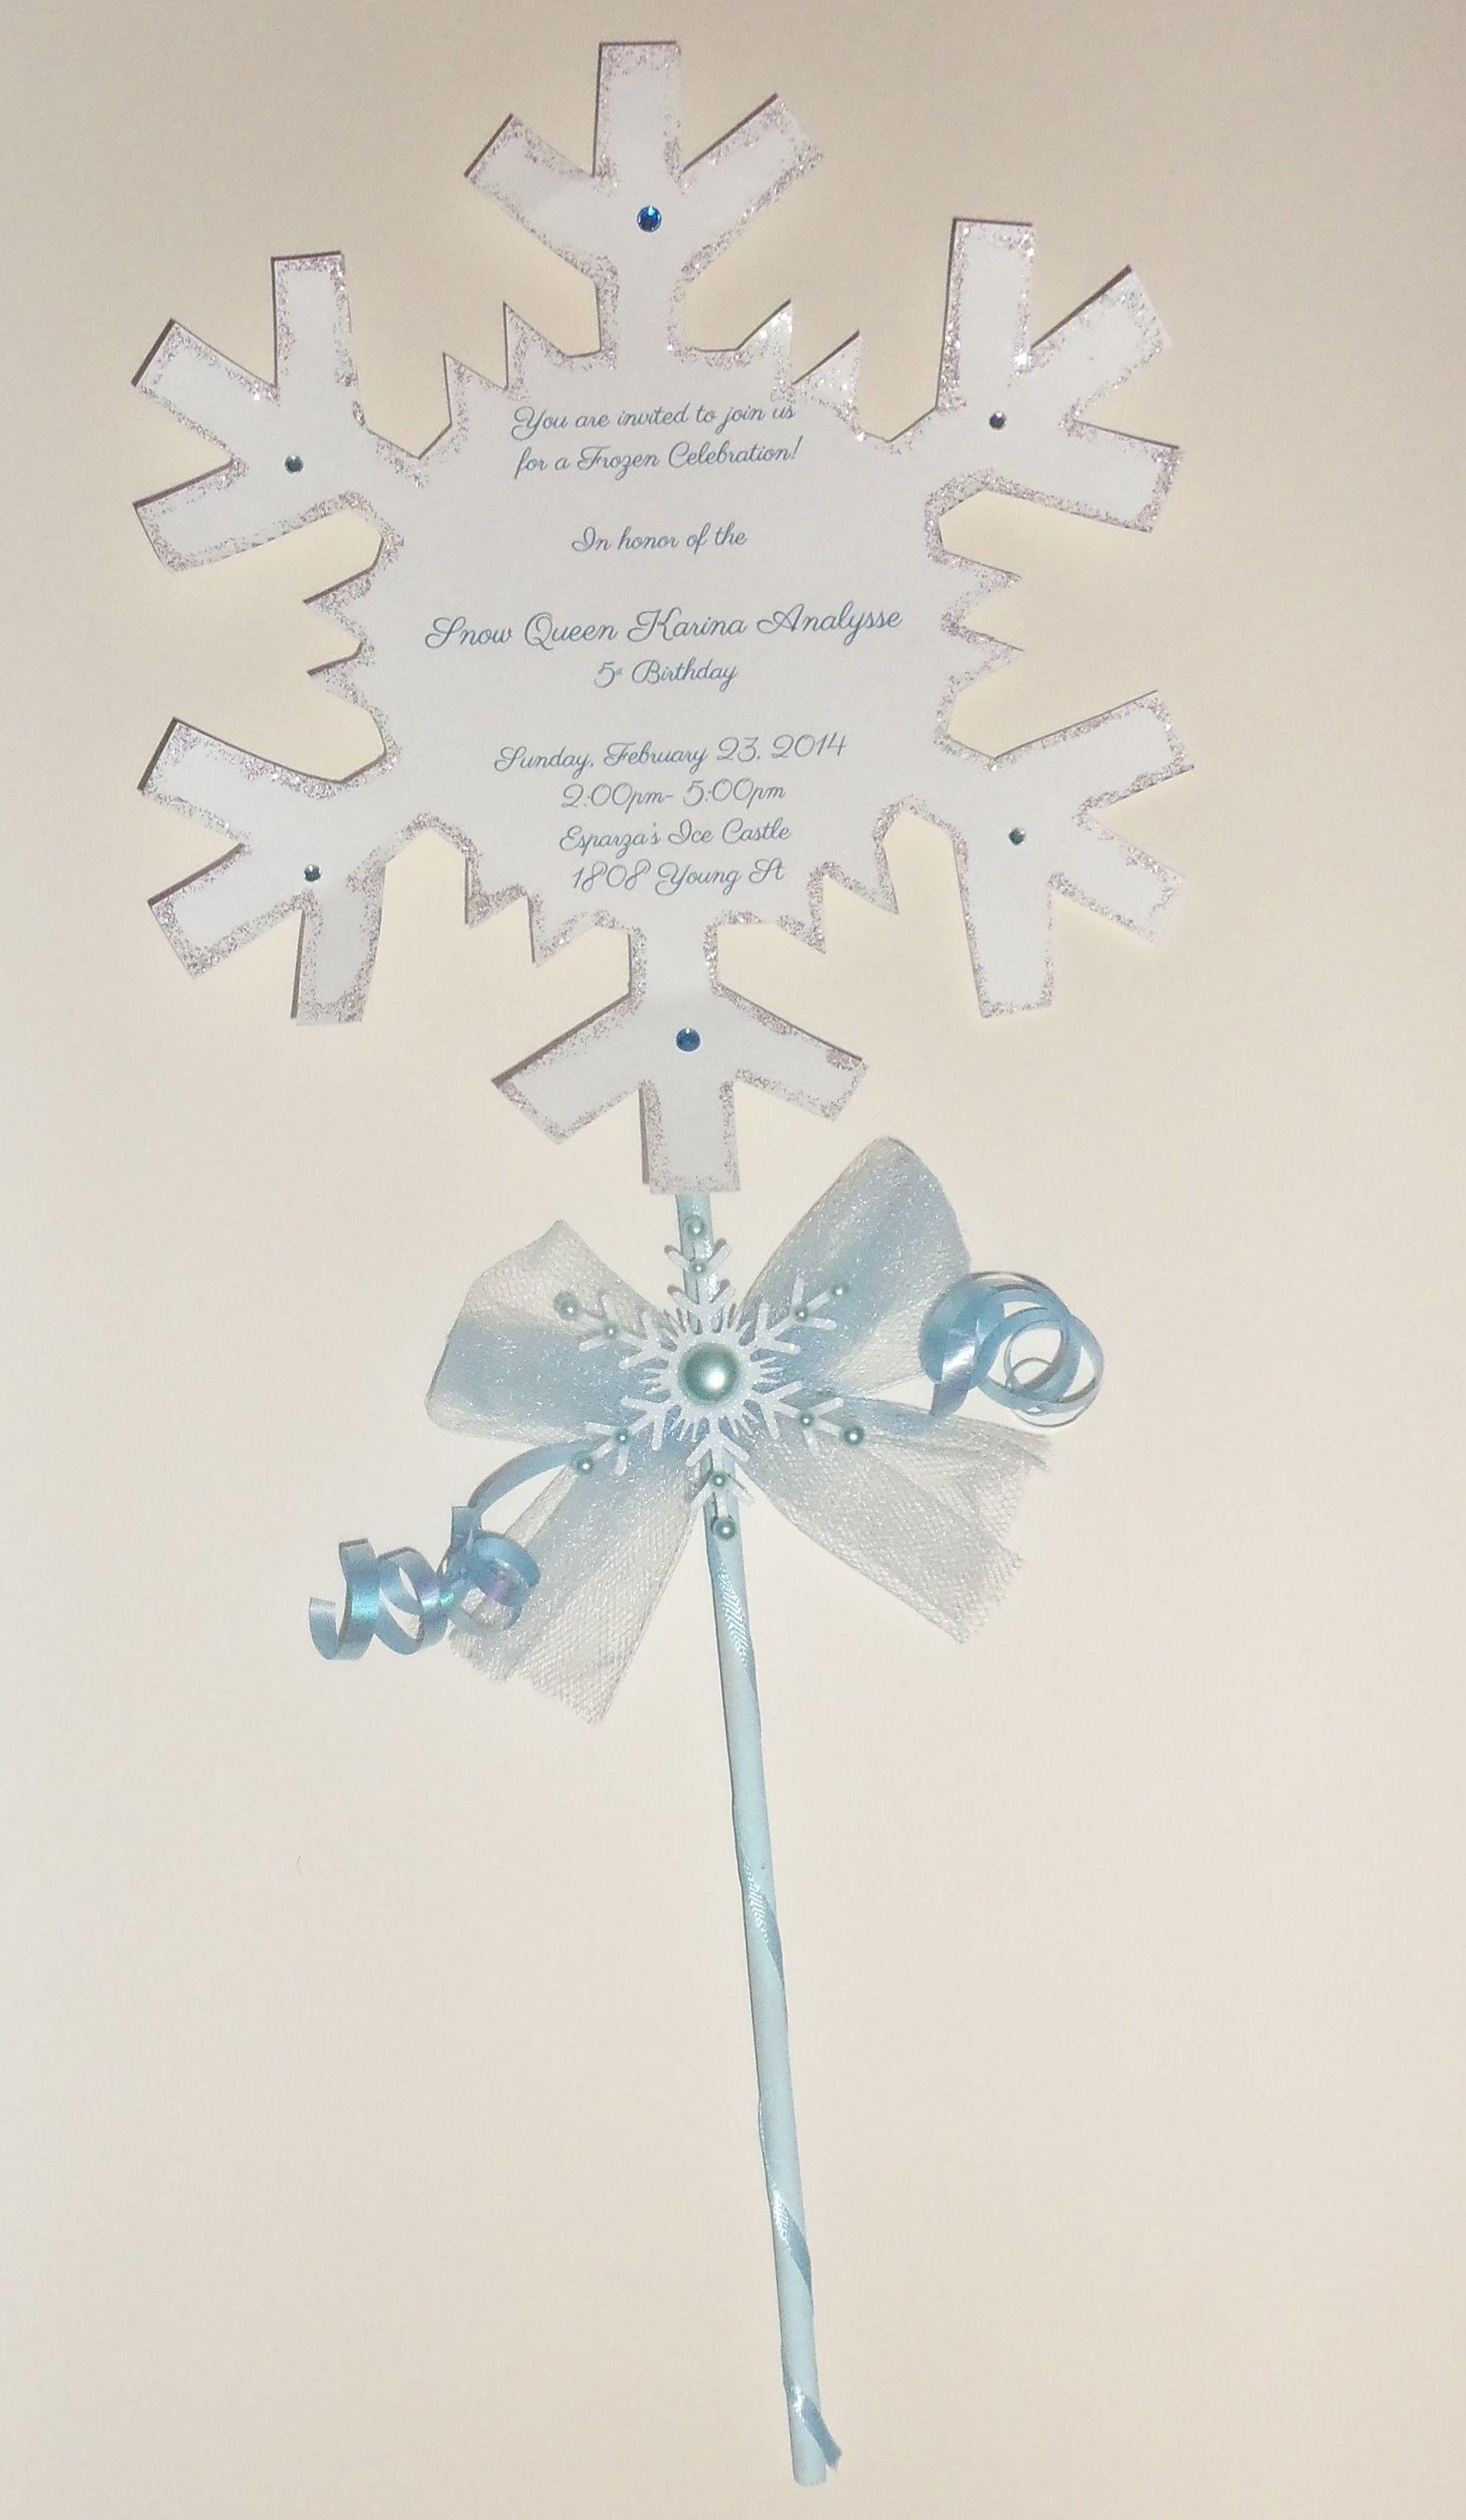 Frozen Party Invitations | Froozed | Pinterest | Frozen birthday ...